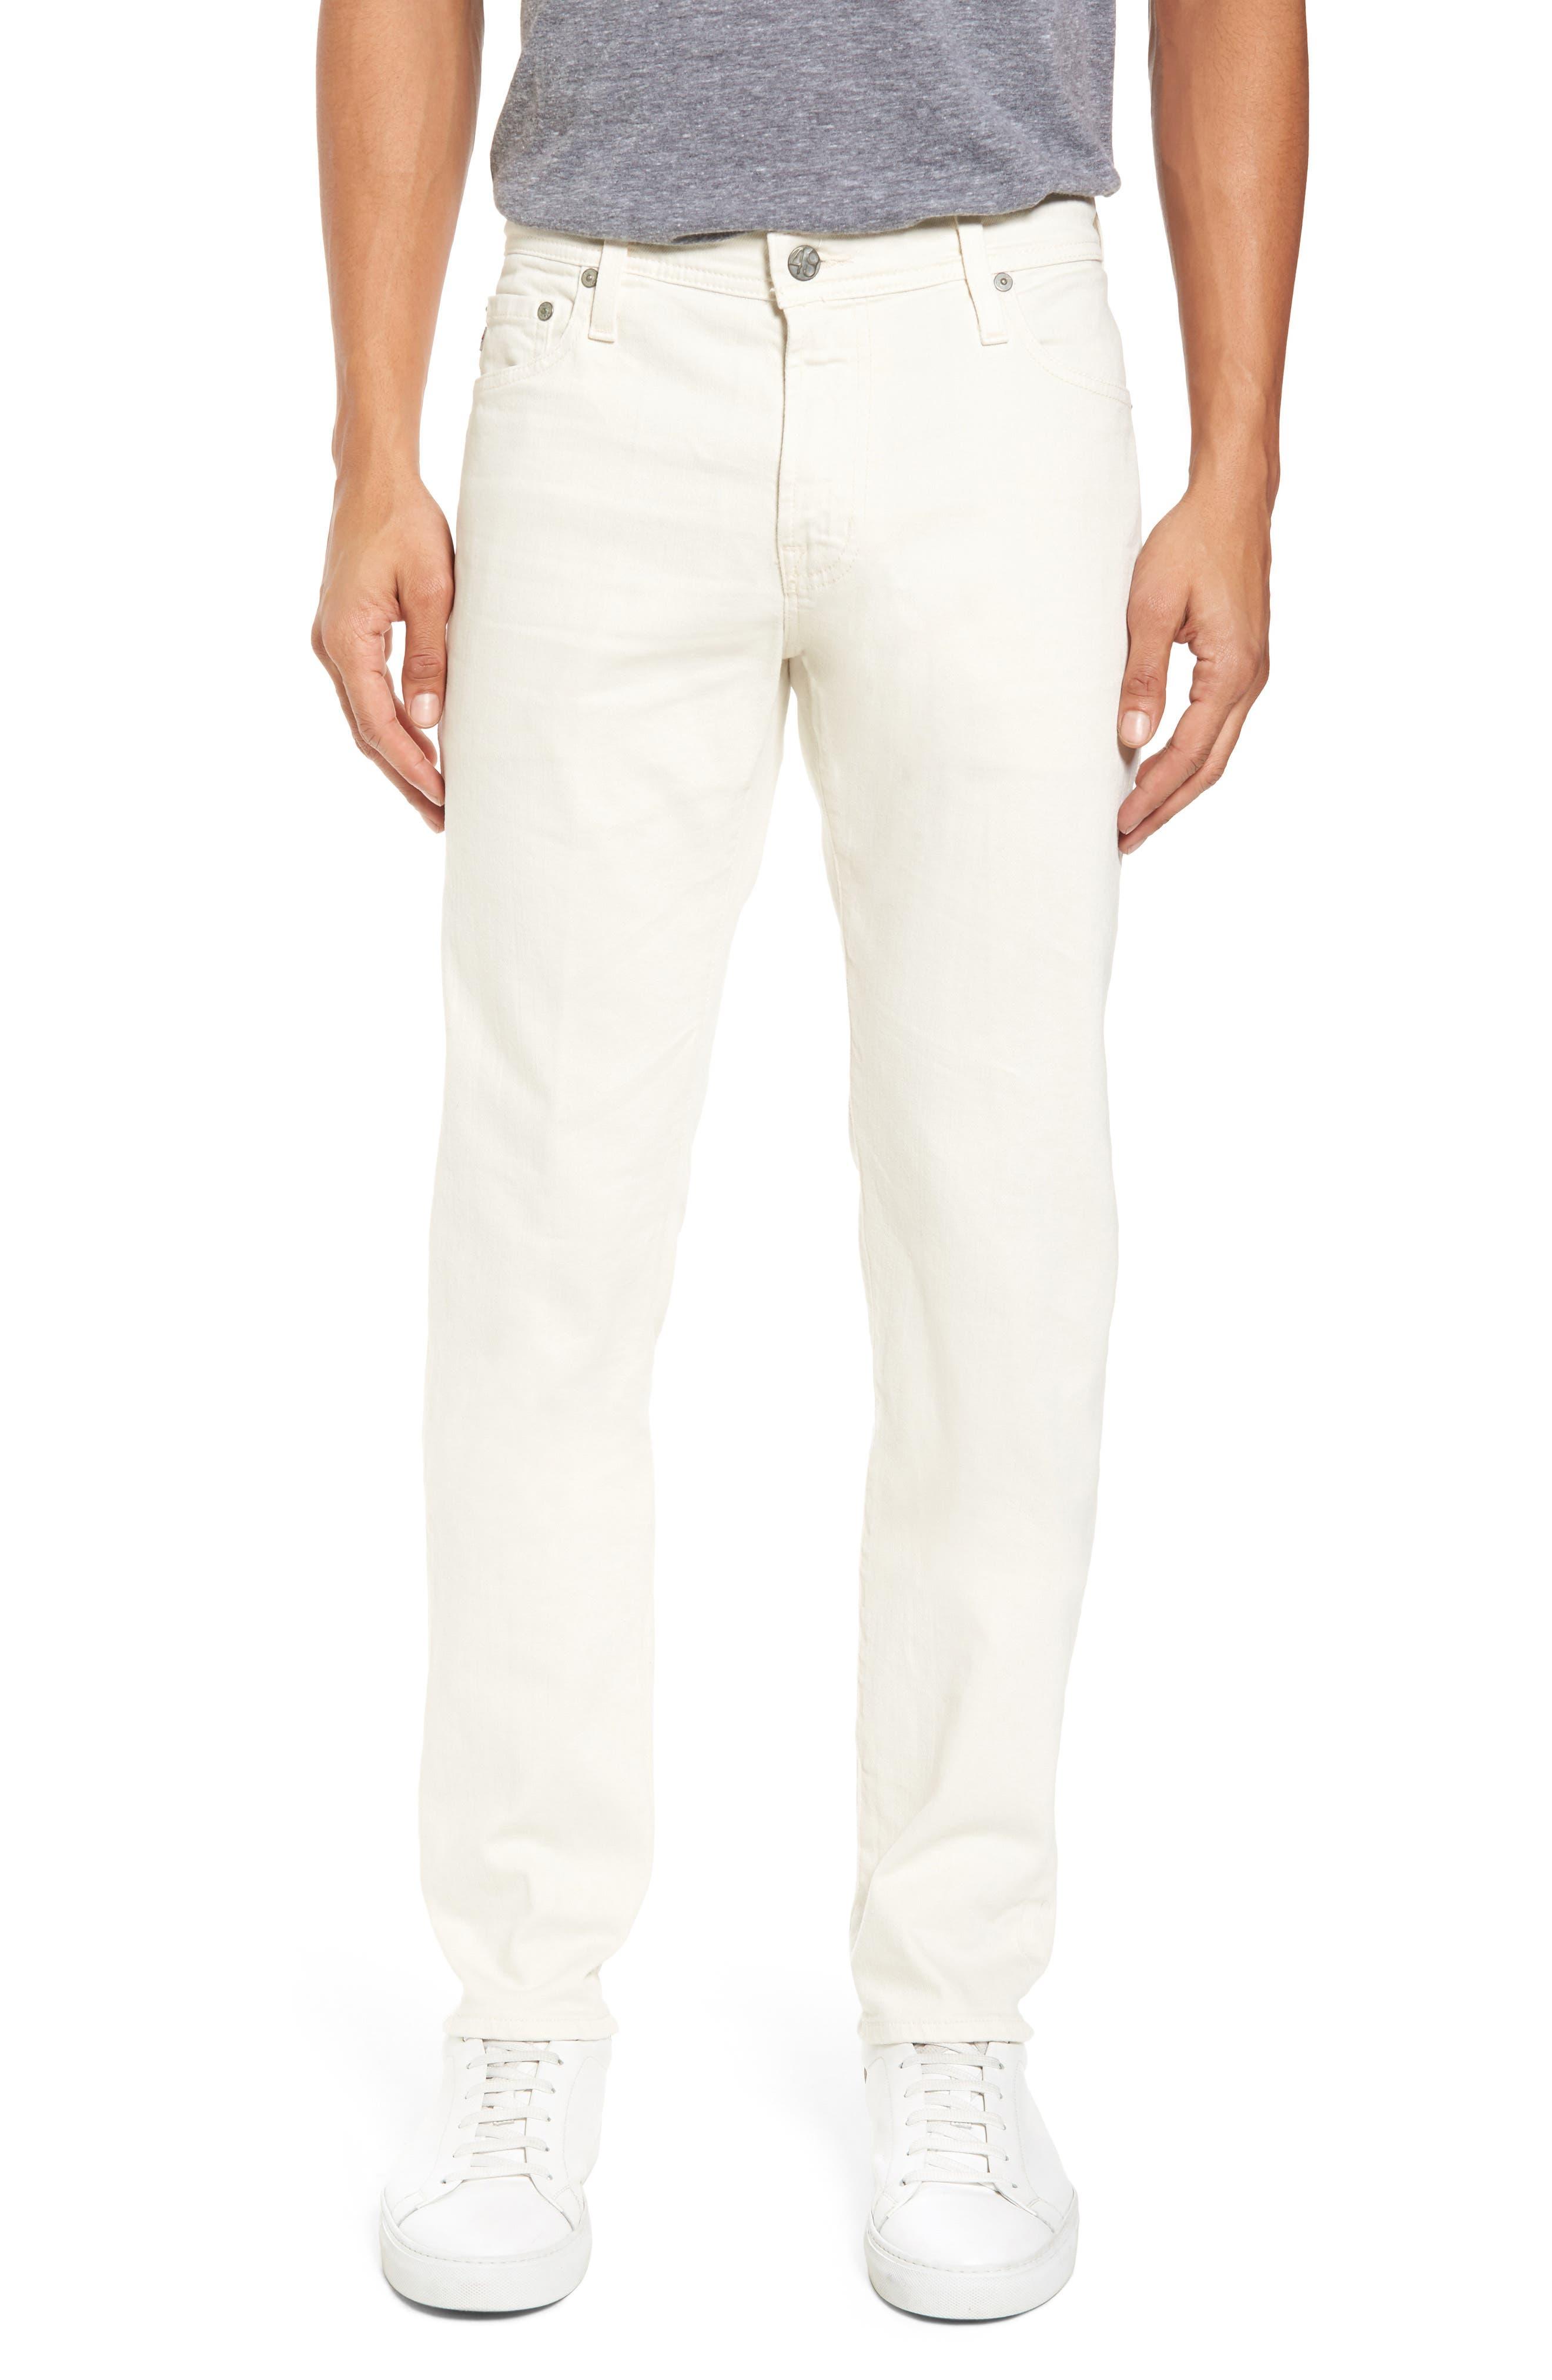 Tellis Modern Slim Twill Pants,                             Main thumbnail 1, color,                             020